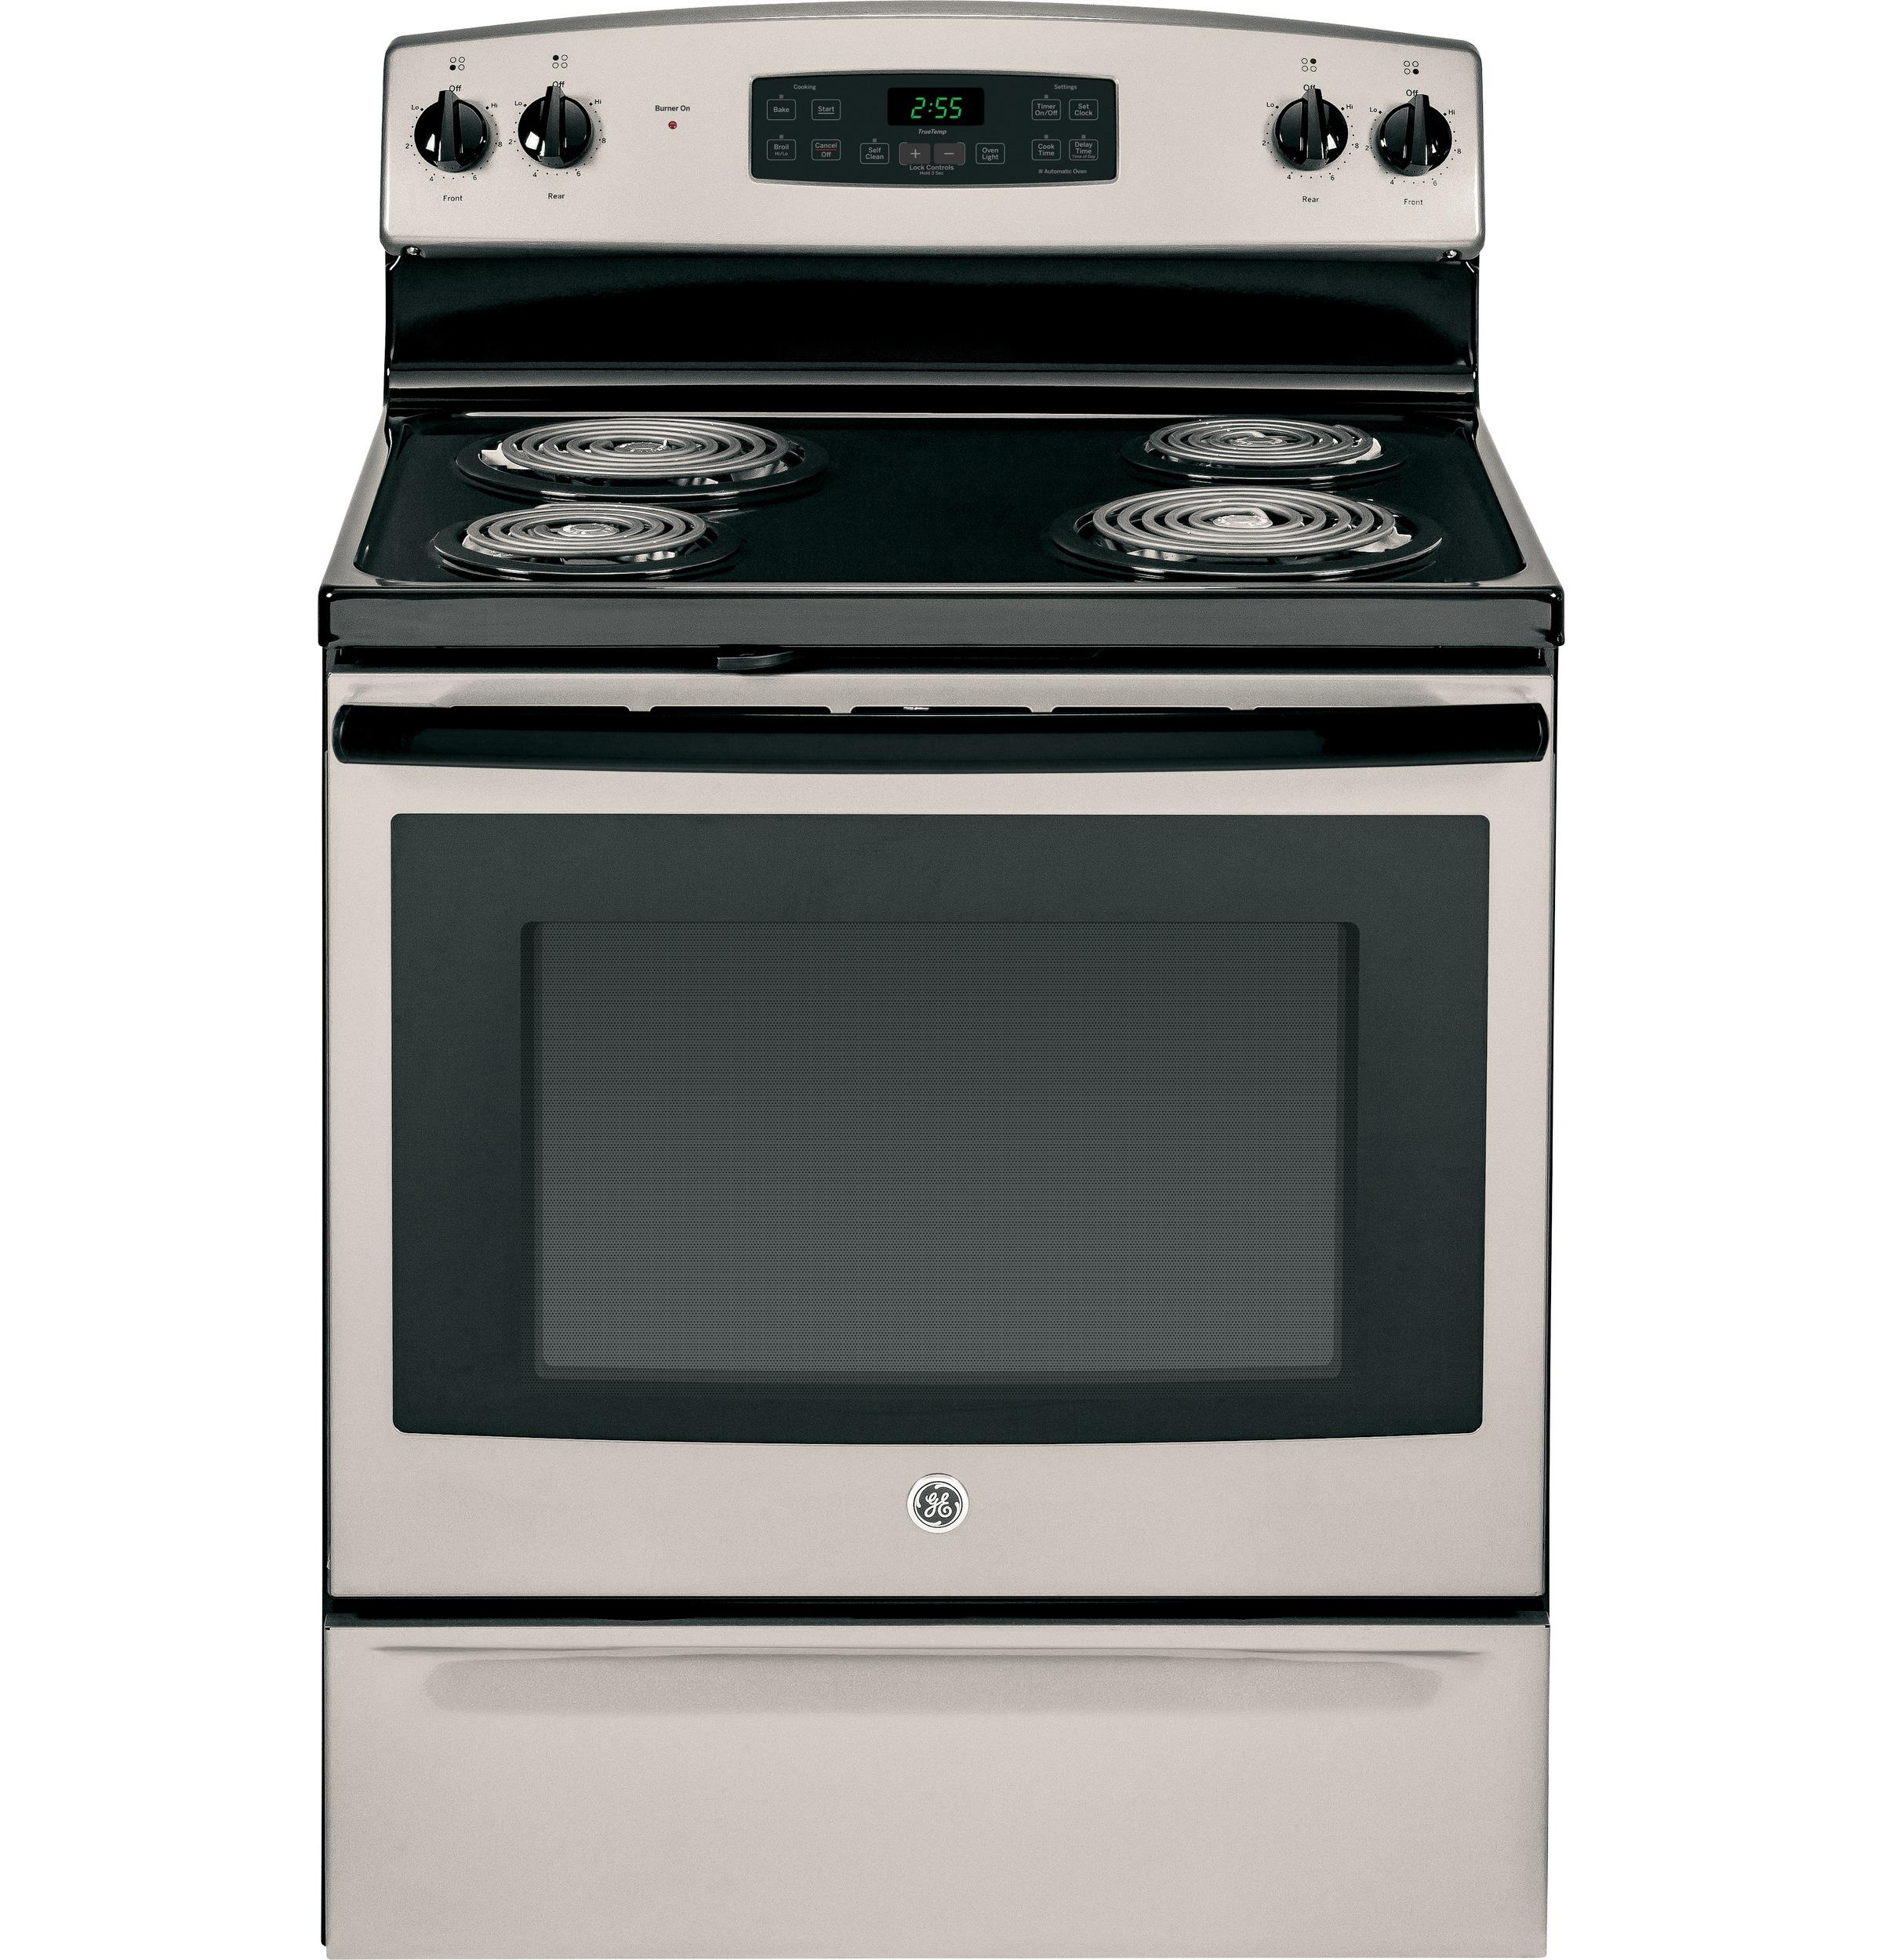 "GE Appliances GE Electric Ranges 30"" Free-Standing Electric Range - Item Number: JB255GJSA"